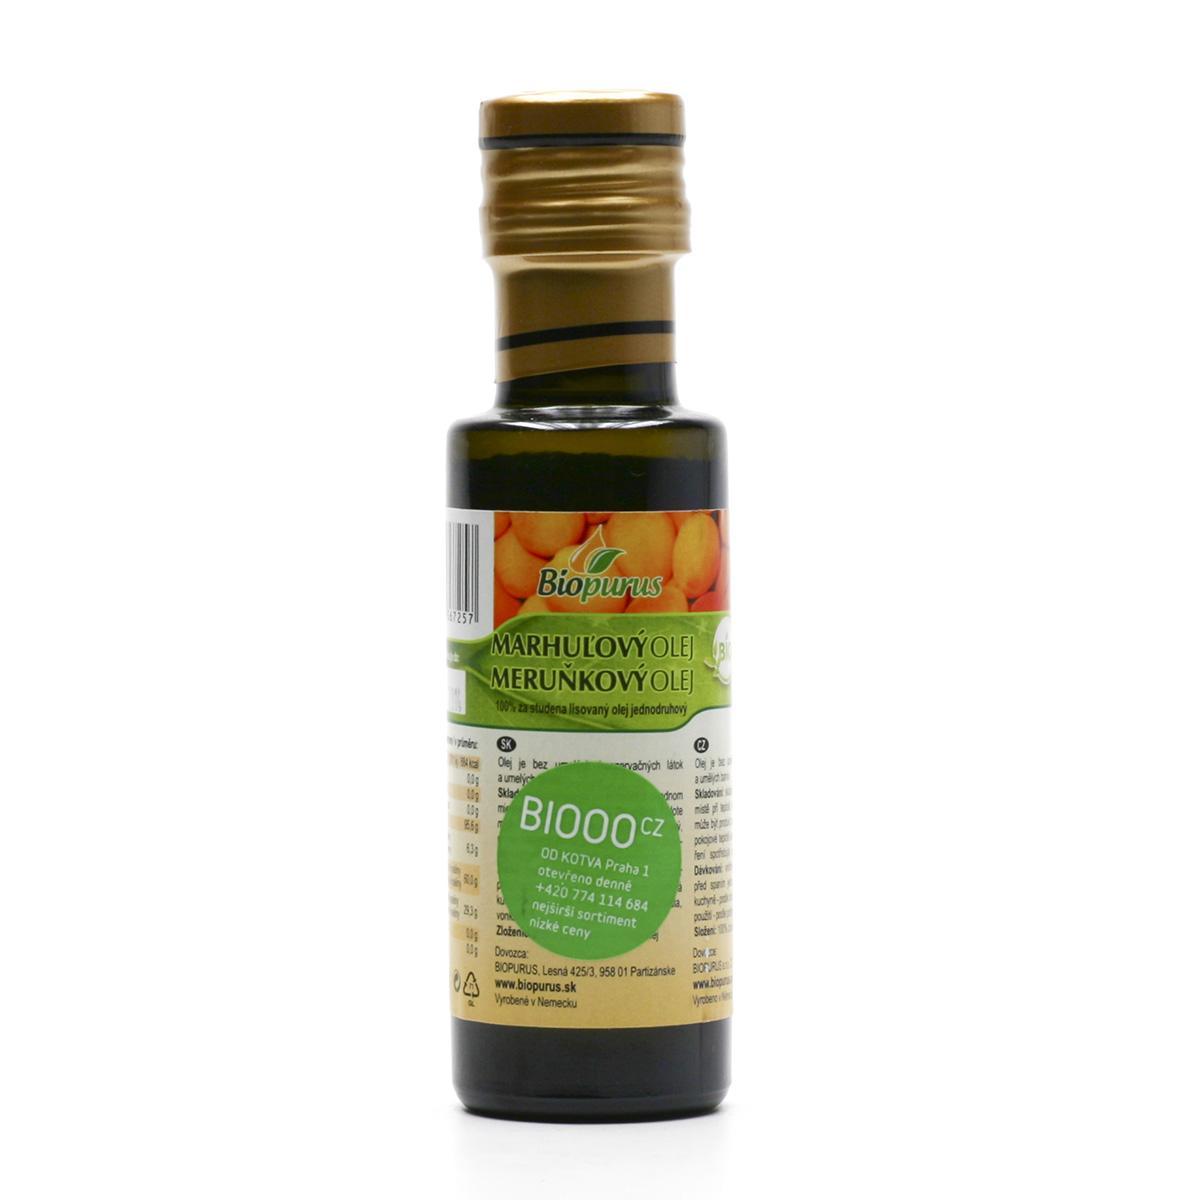 Biopurus Meruňkový olej bio 100 ml